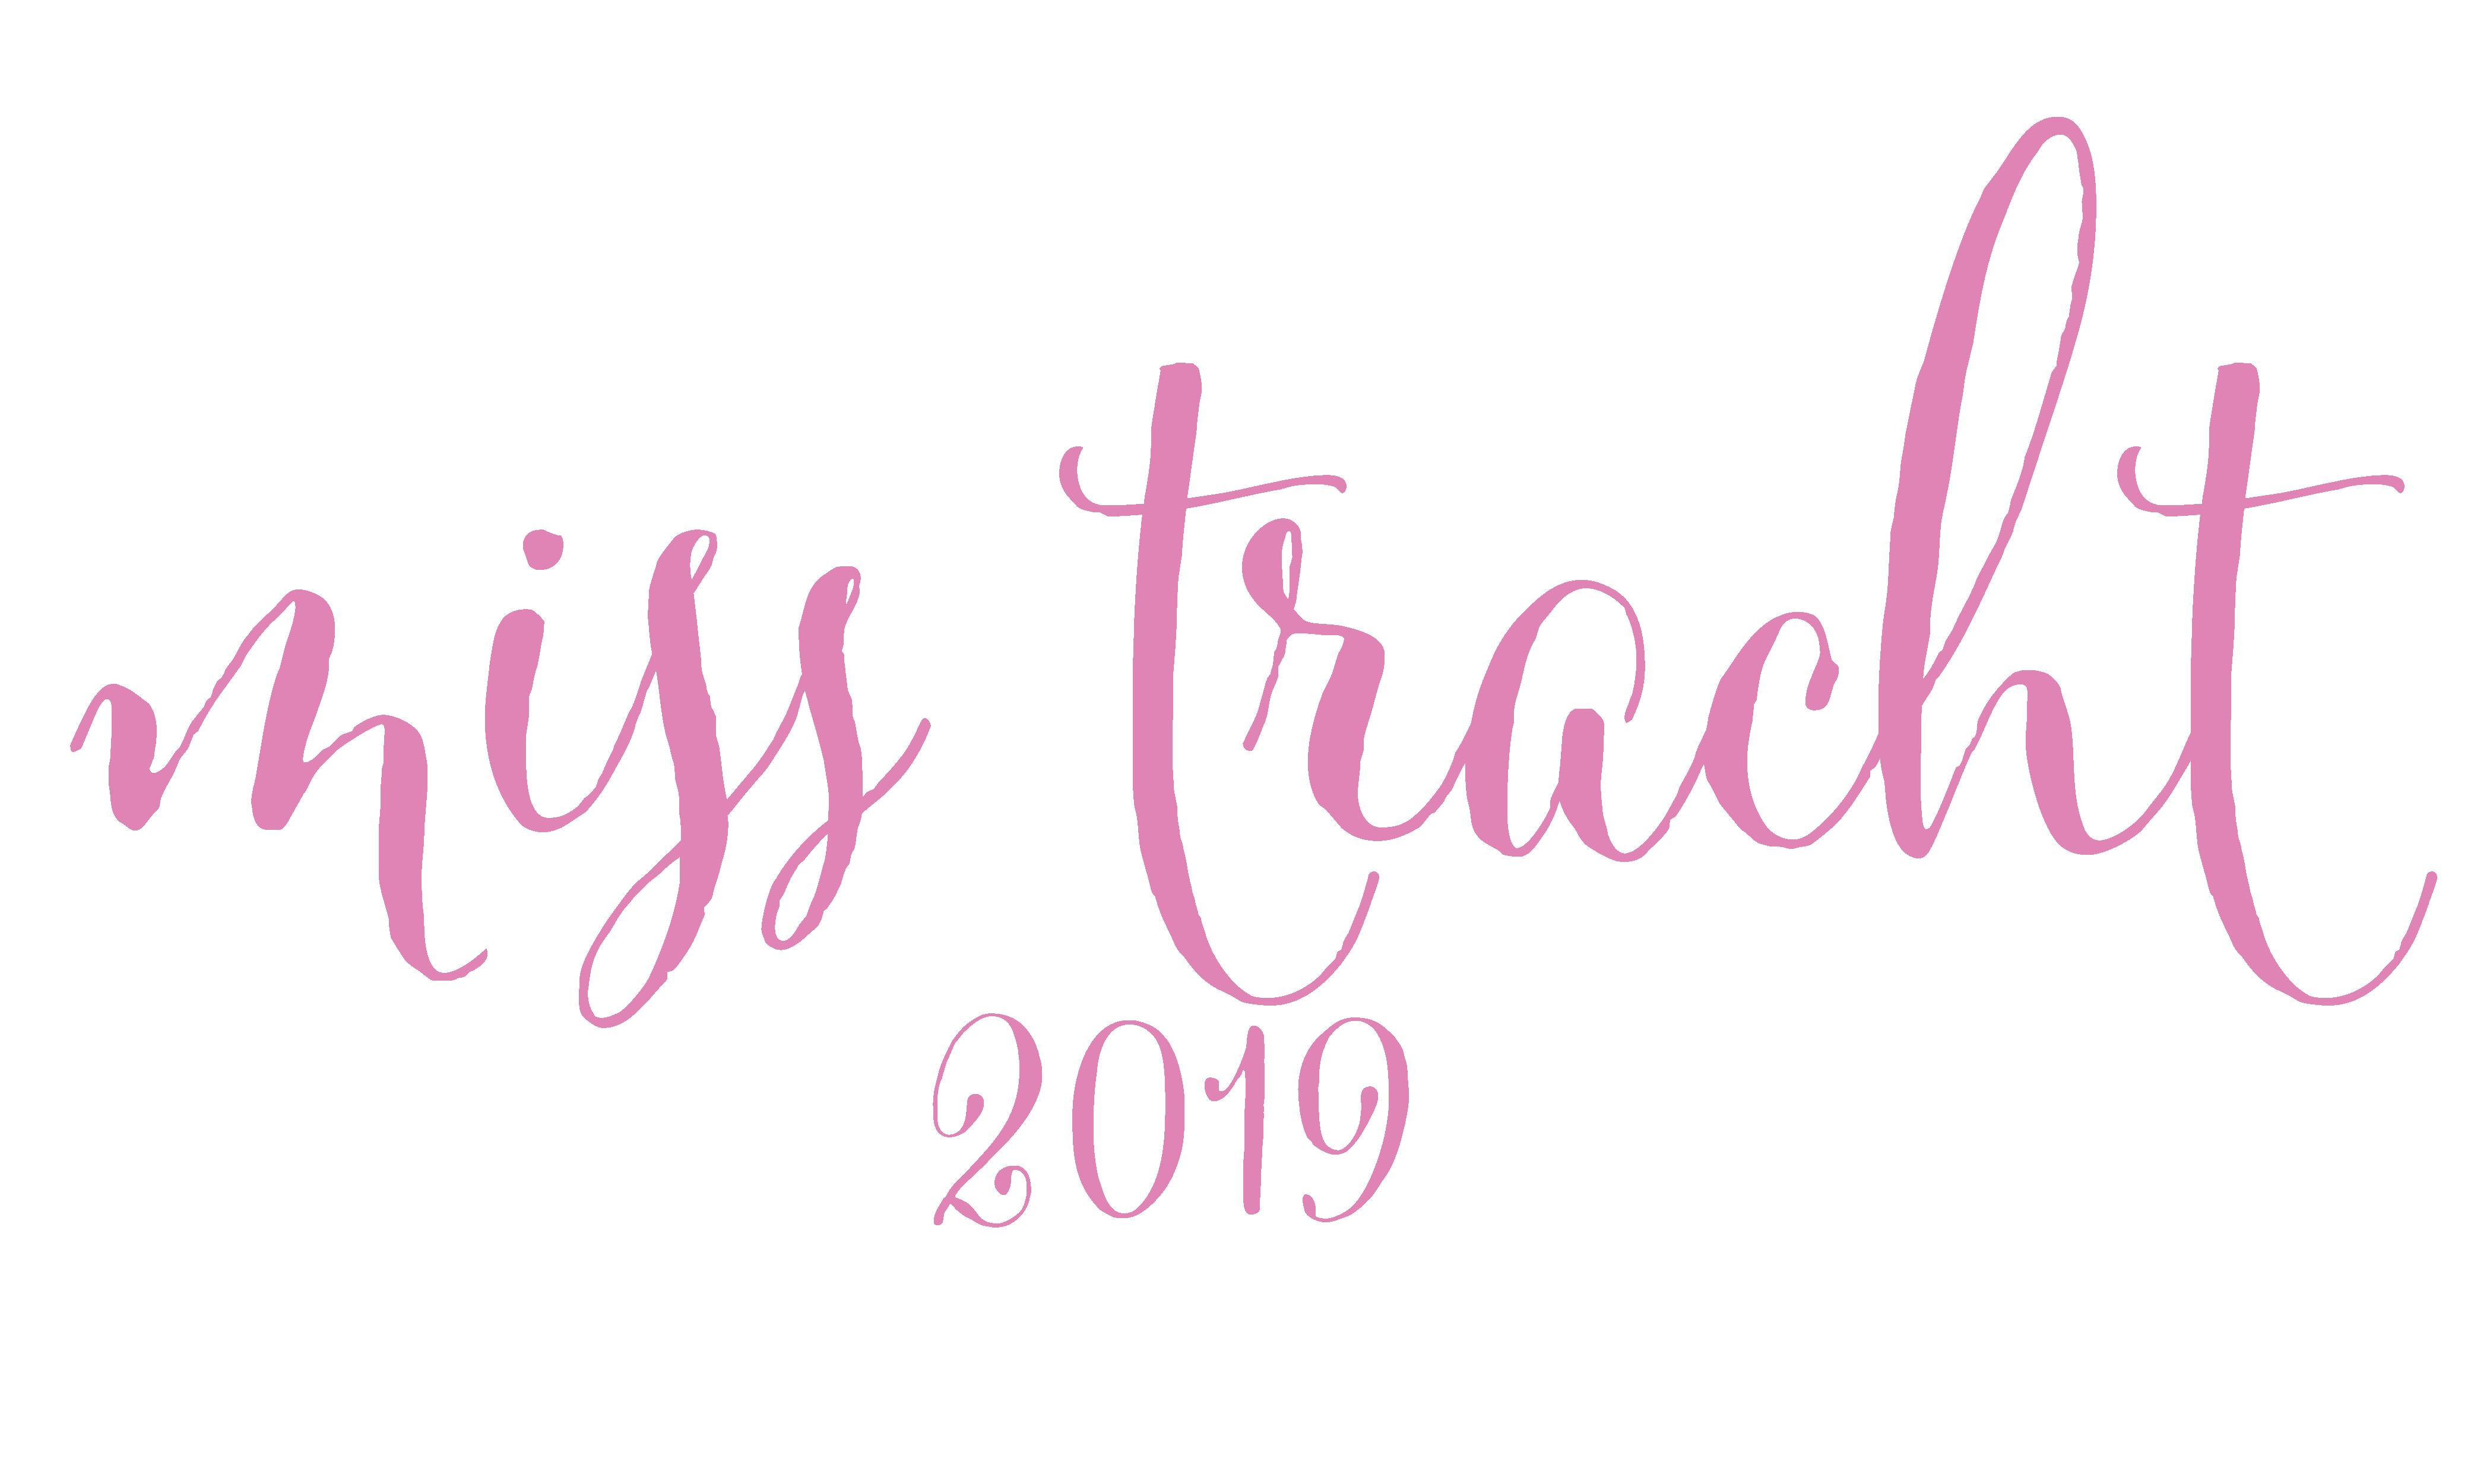 Miss Tracht 2018